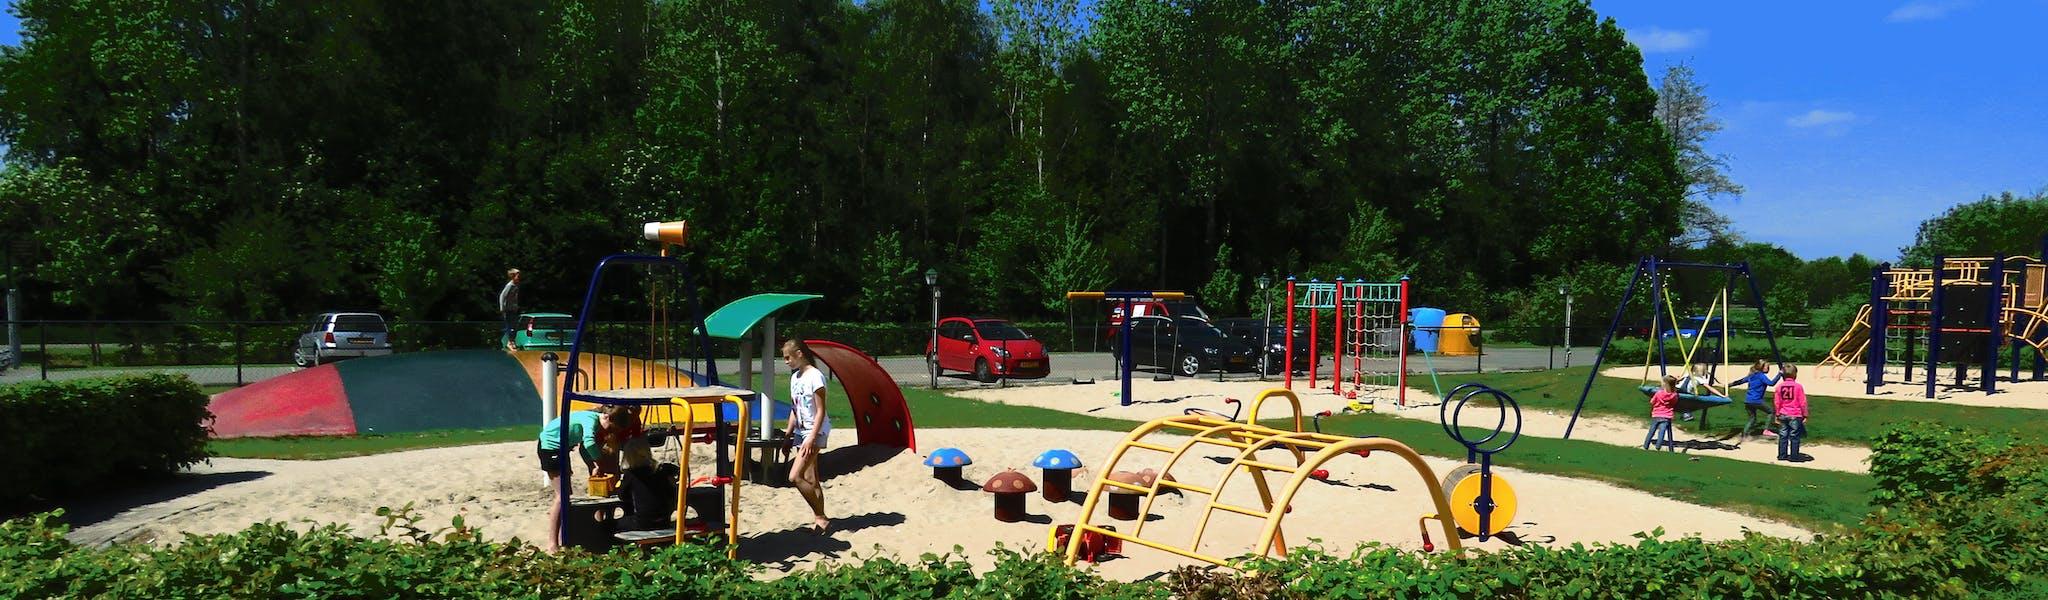 Camping de Molnhofte speeltuin